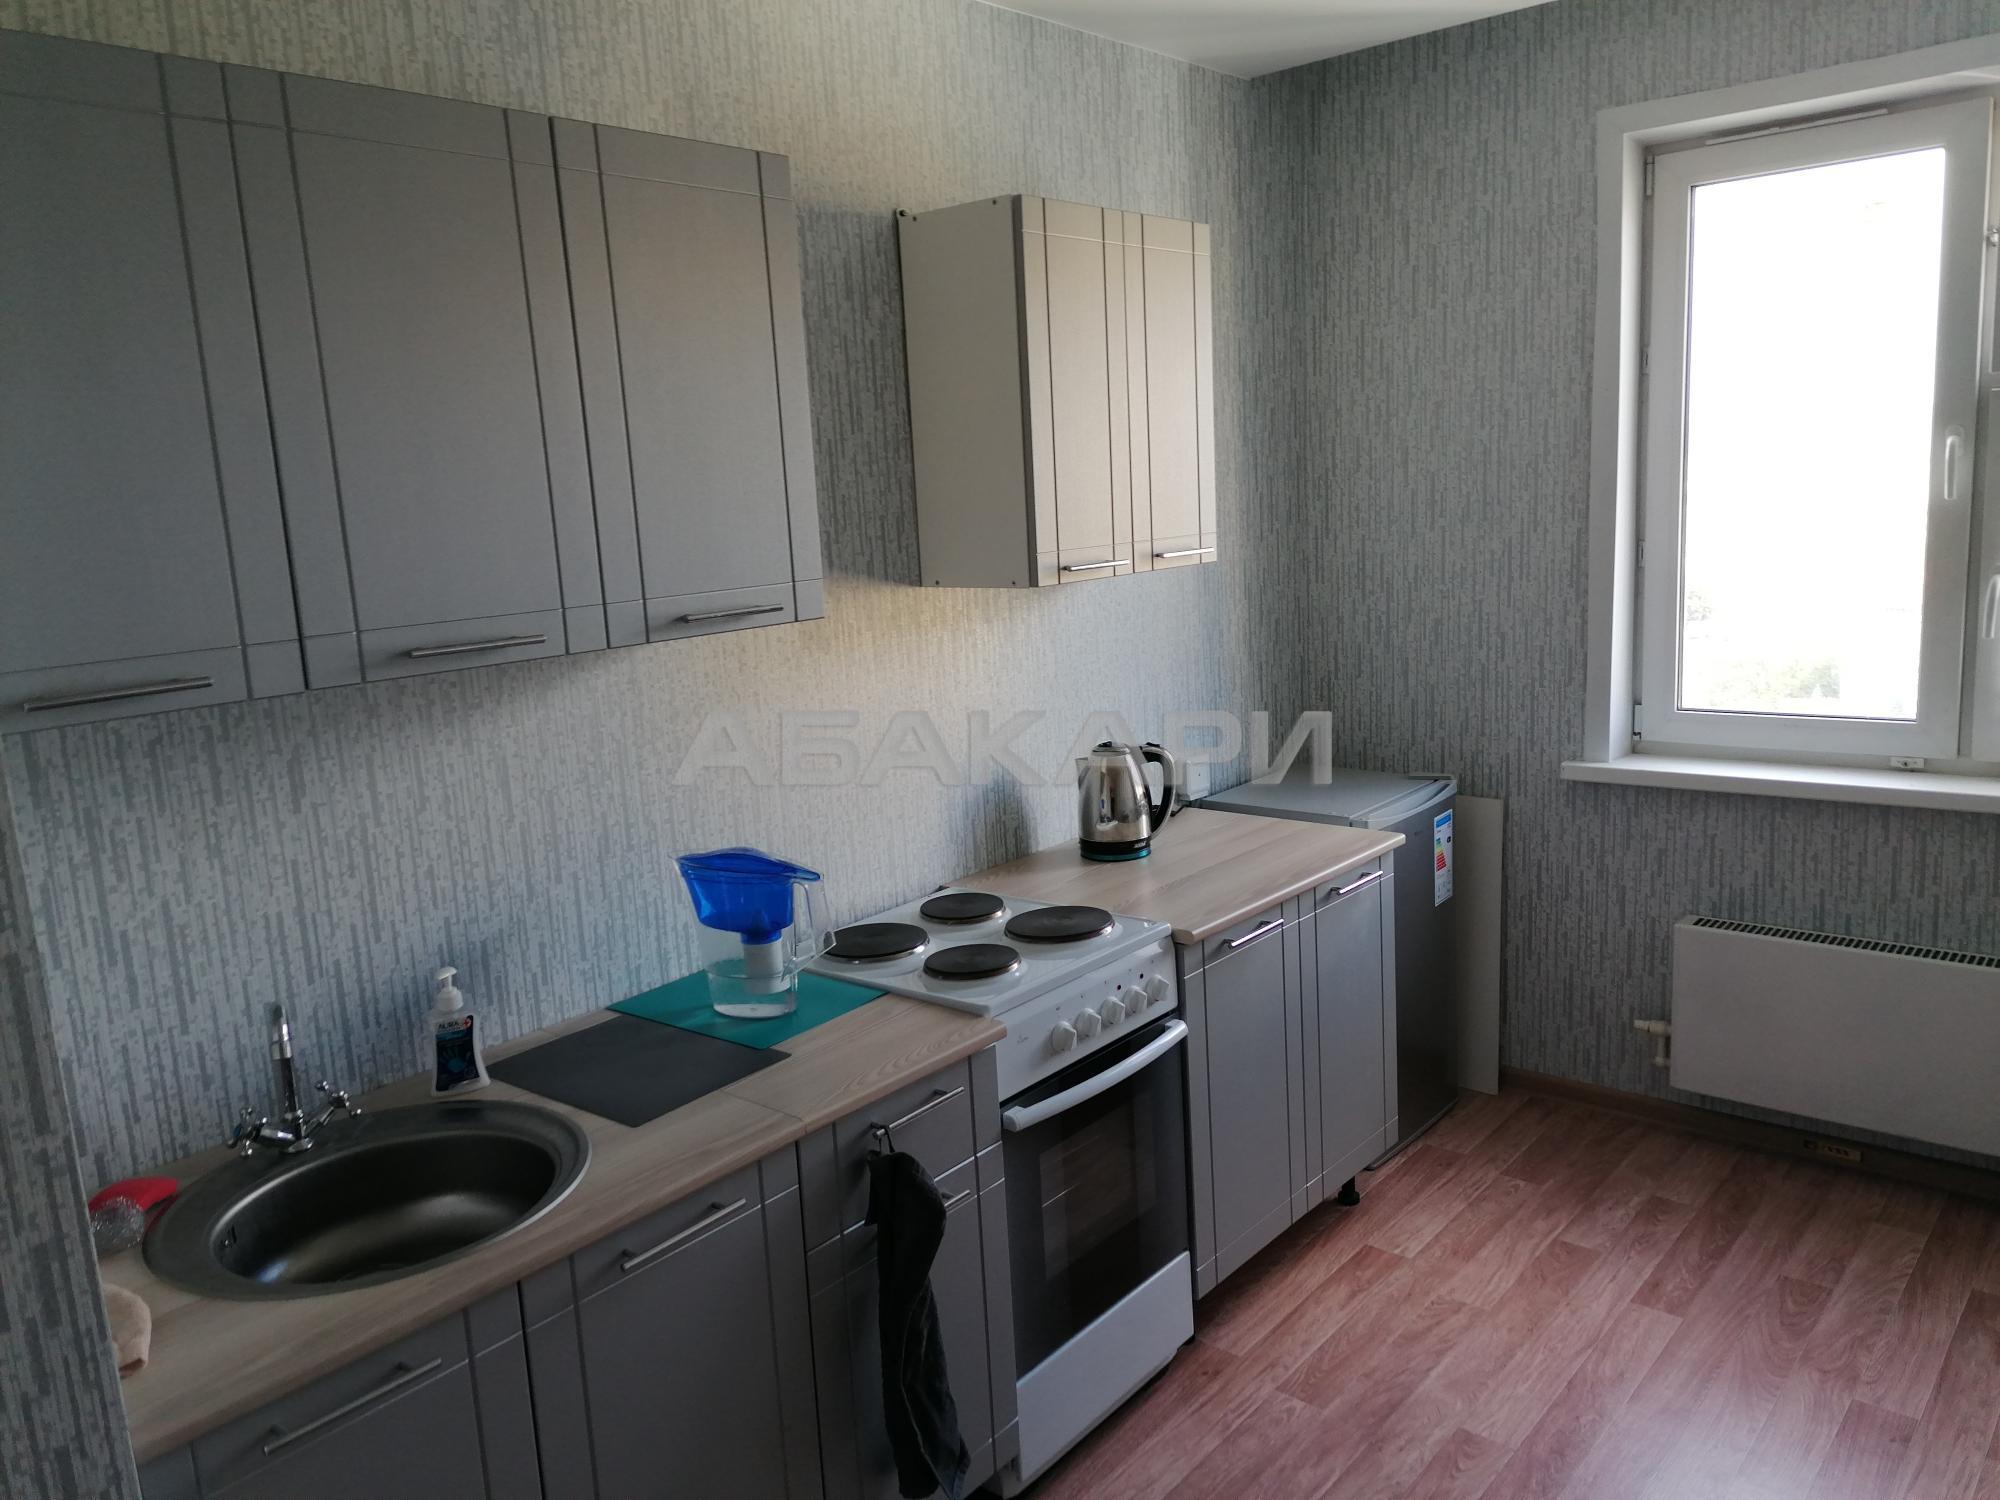 2к квартира Лесопарковая улица, 17 | 21000 | аренда в Красноярске фото 7